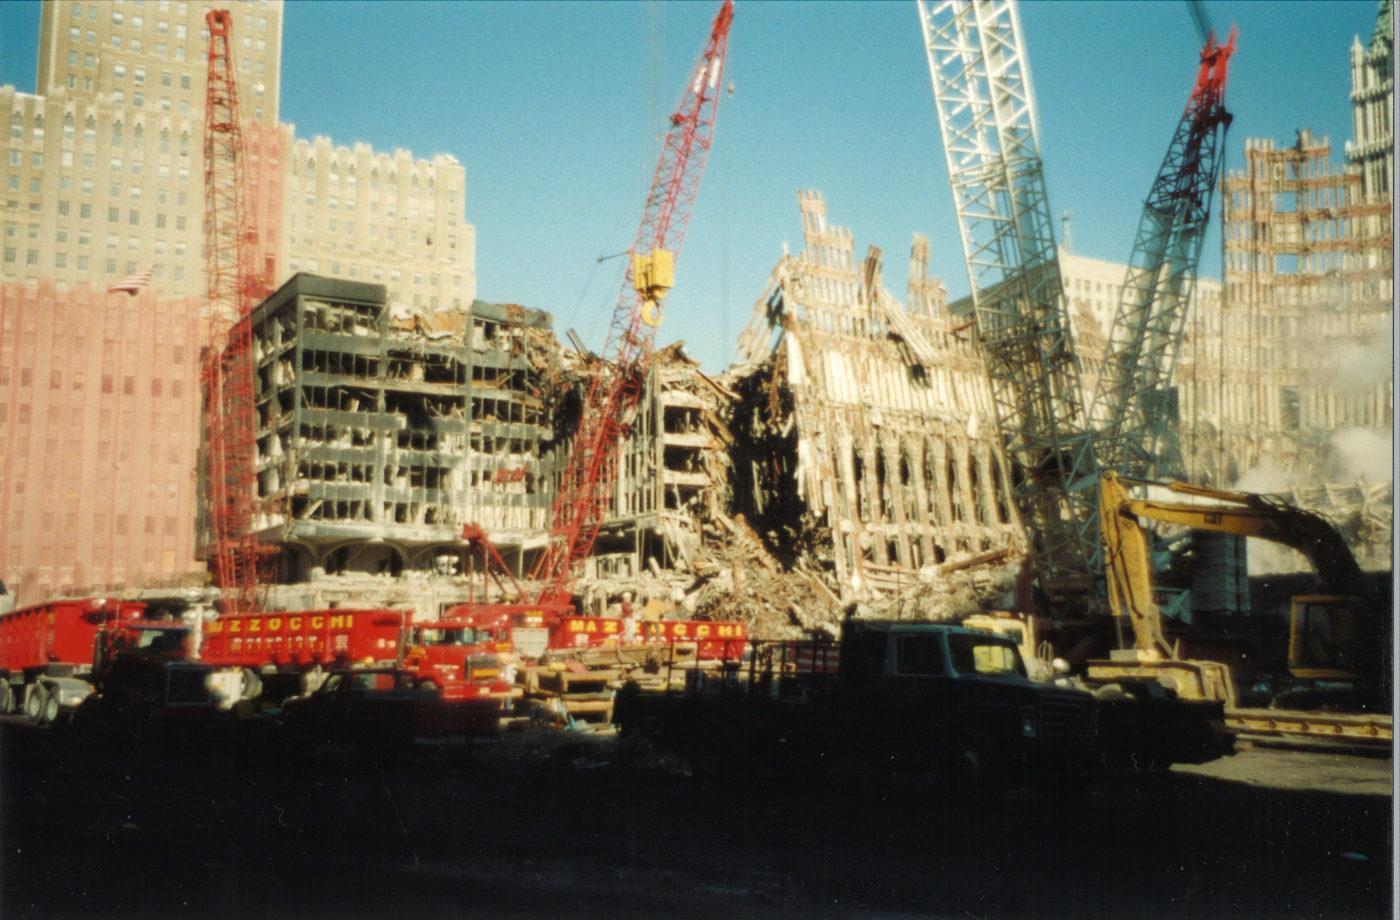 Cranes Working on Destroyed WTC5